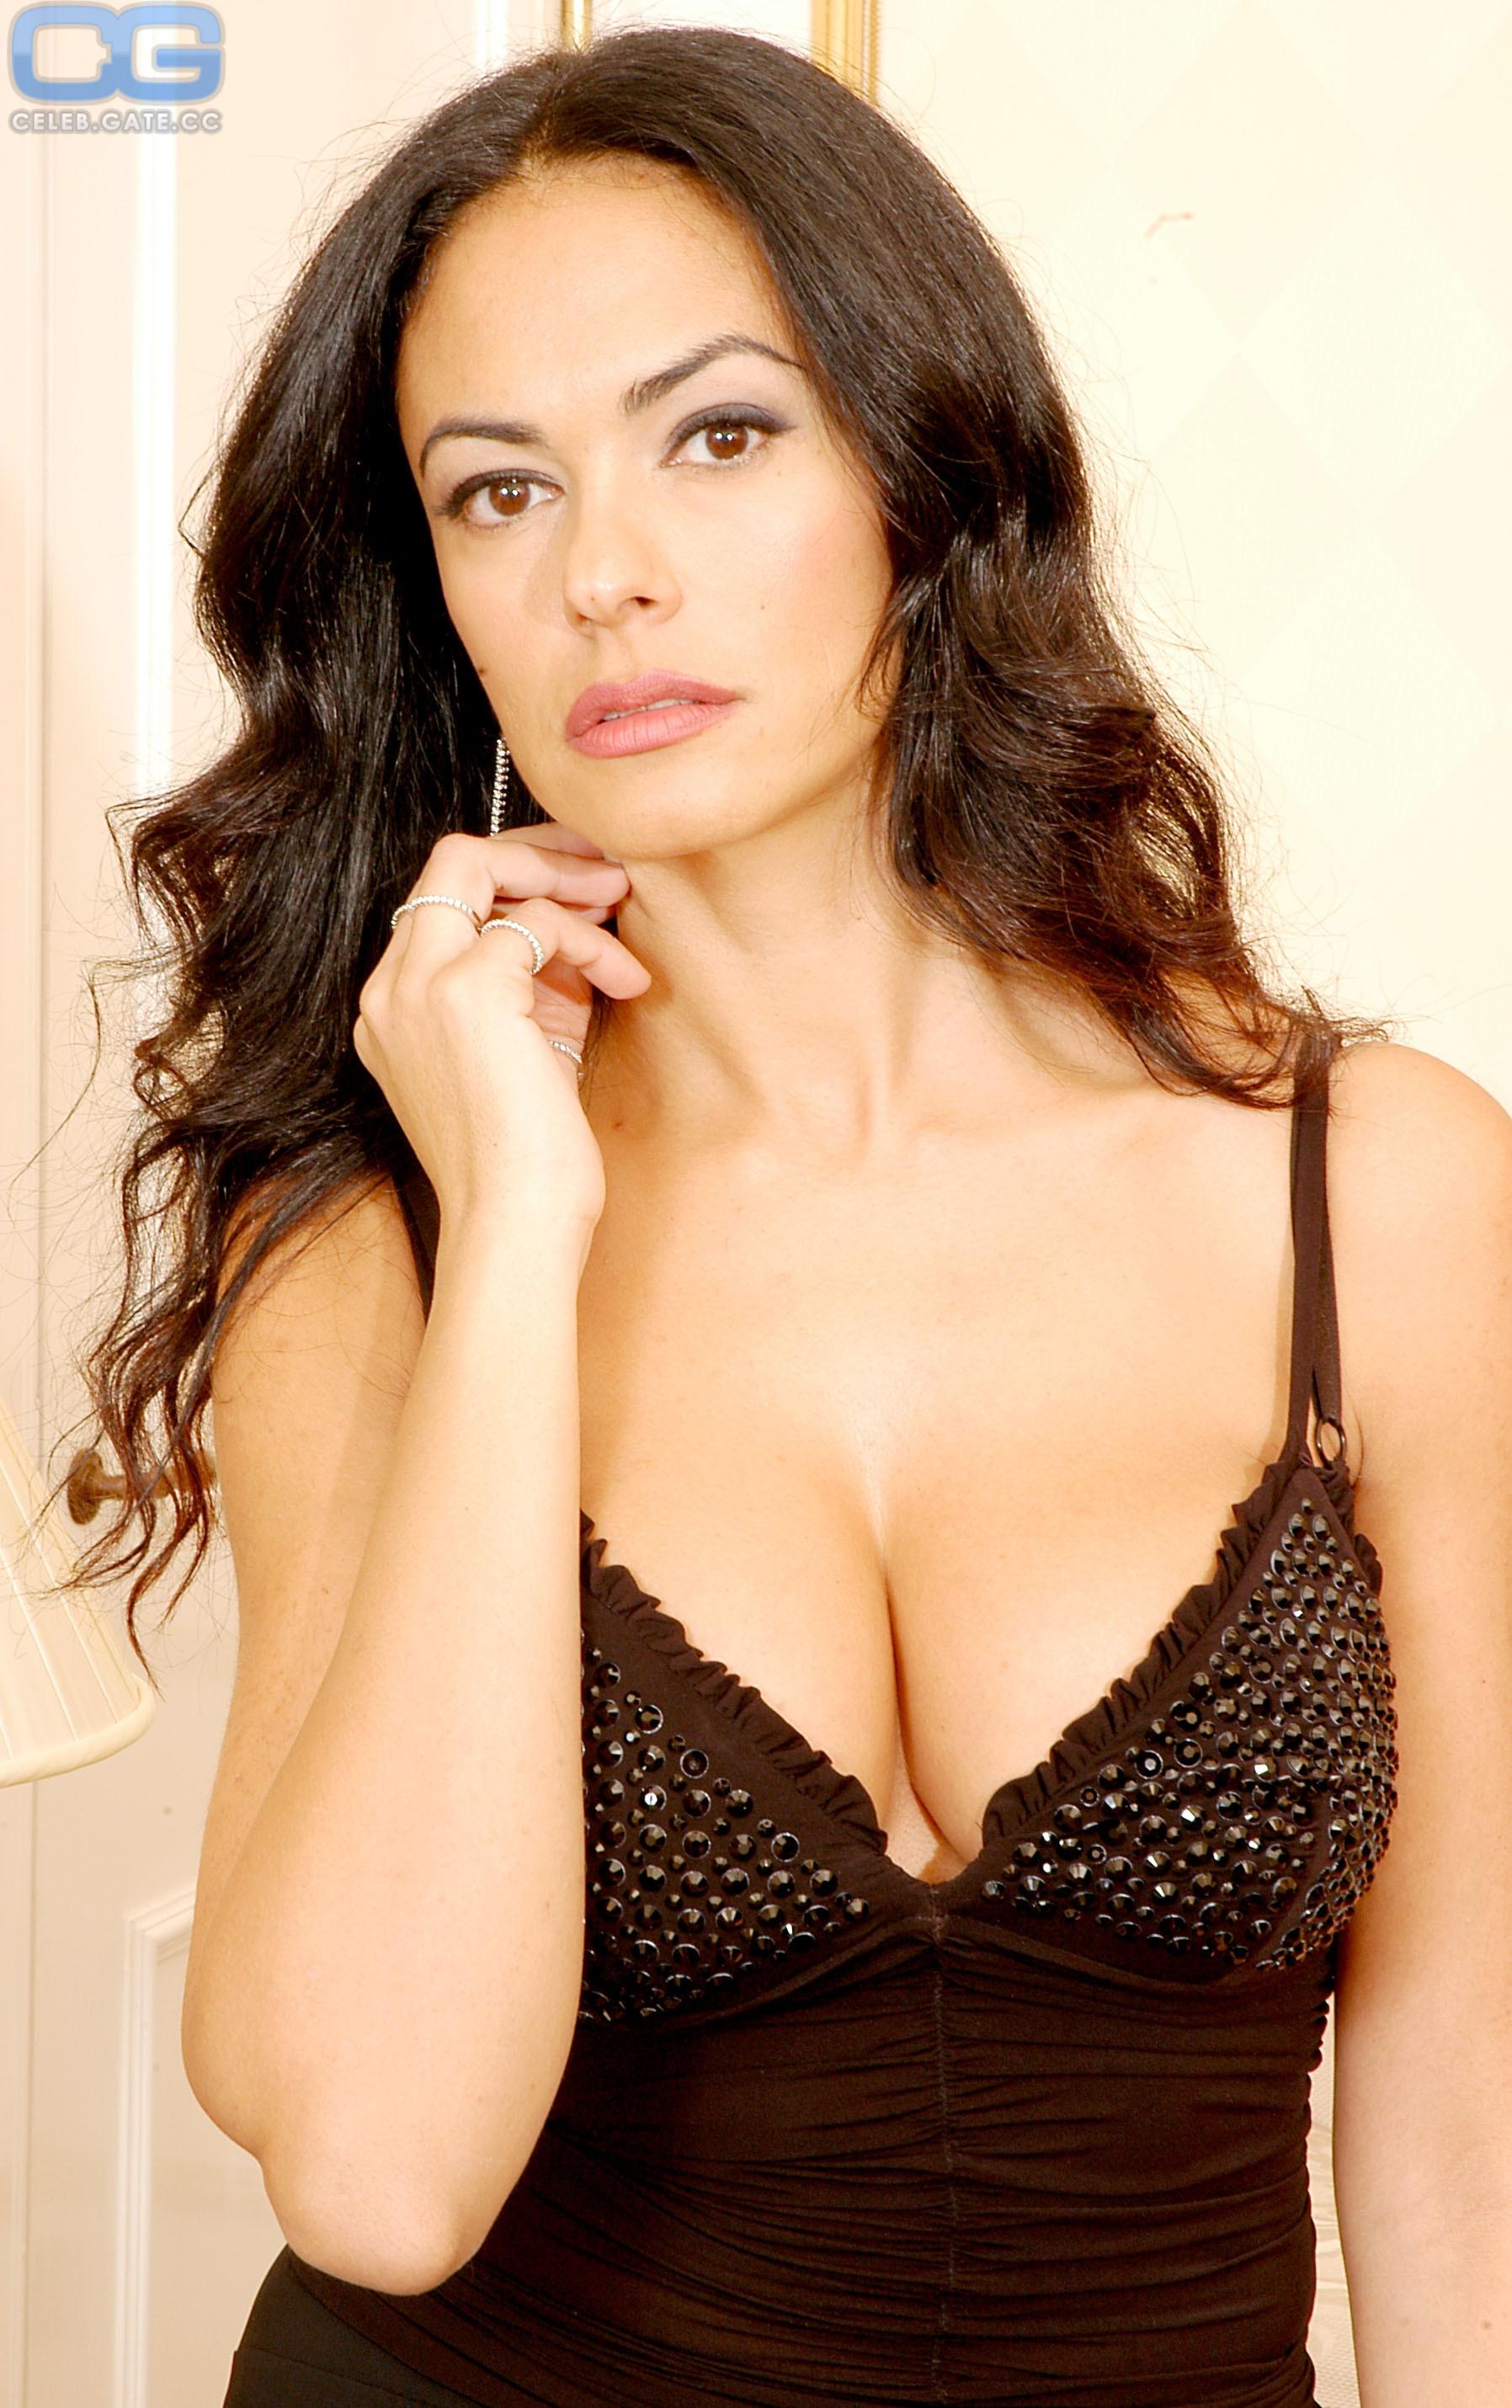 cucinotta-maria-bare-breasts